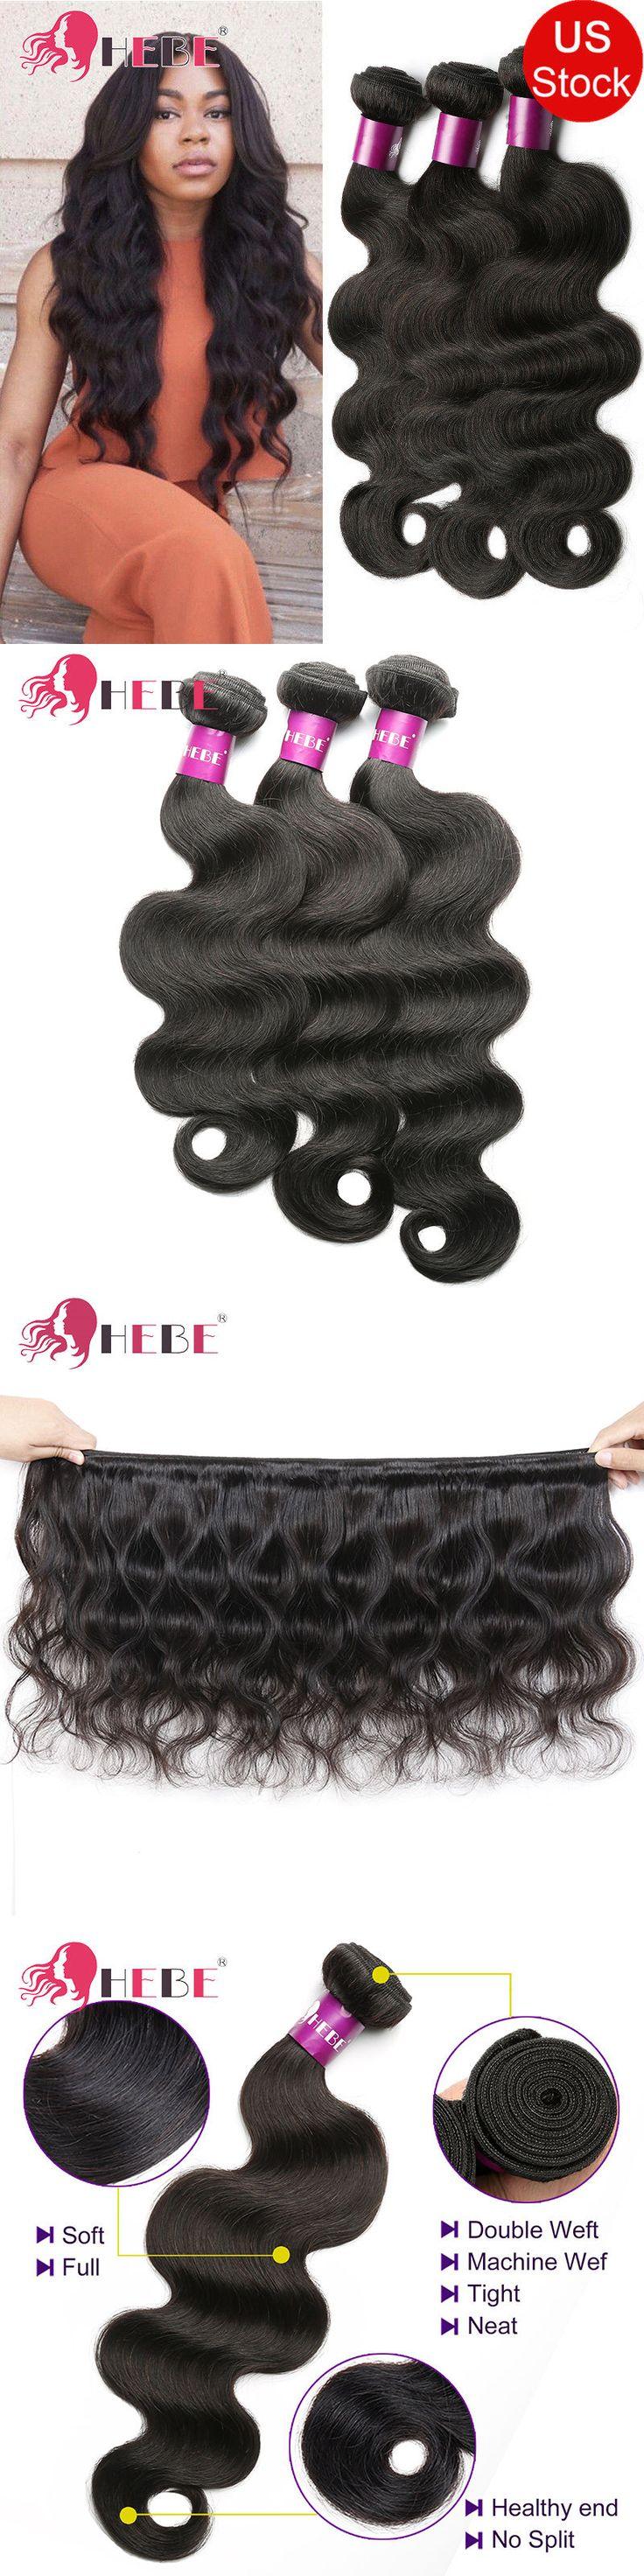 Hair Extensions: Cheap Brazilian Virgin Hair Bundles 100G Bundle Wavy Human Hair Extensions Weave -> BUY IT NOW ONLY: $85.5 on eBay!